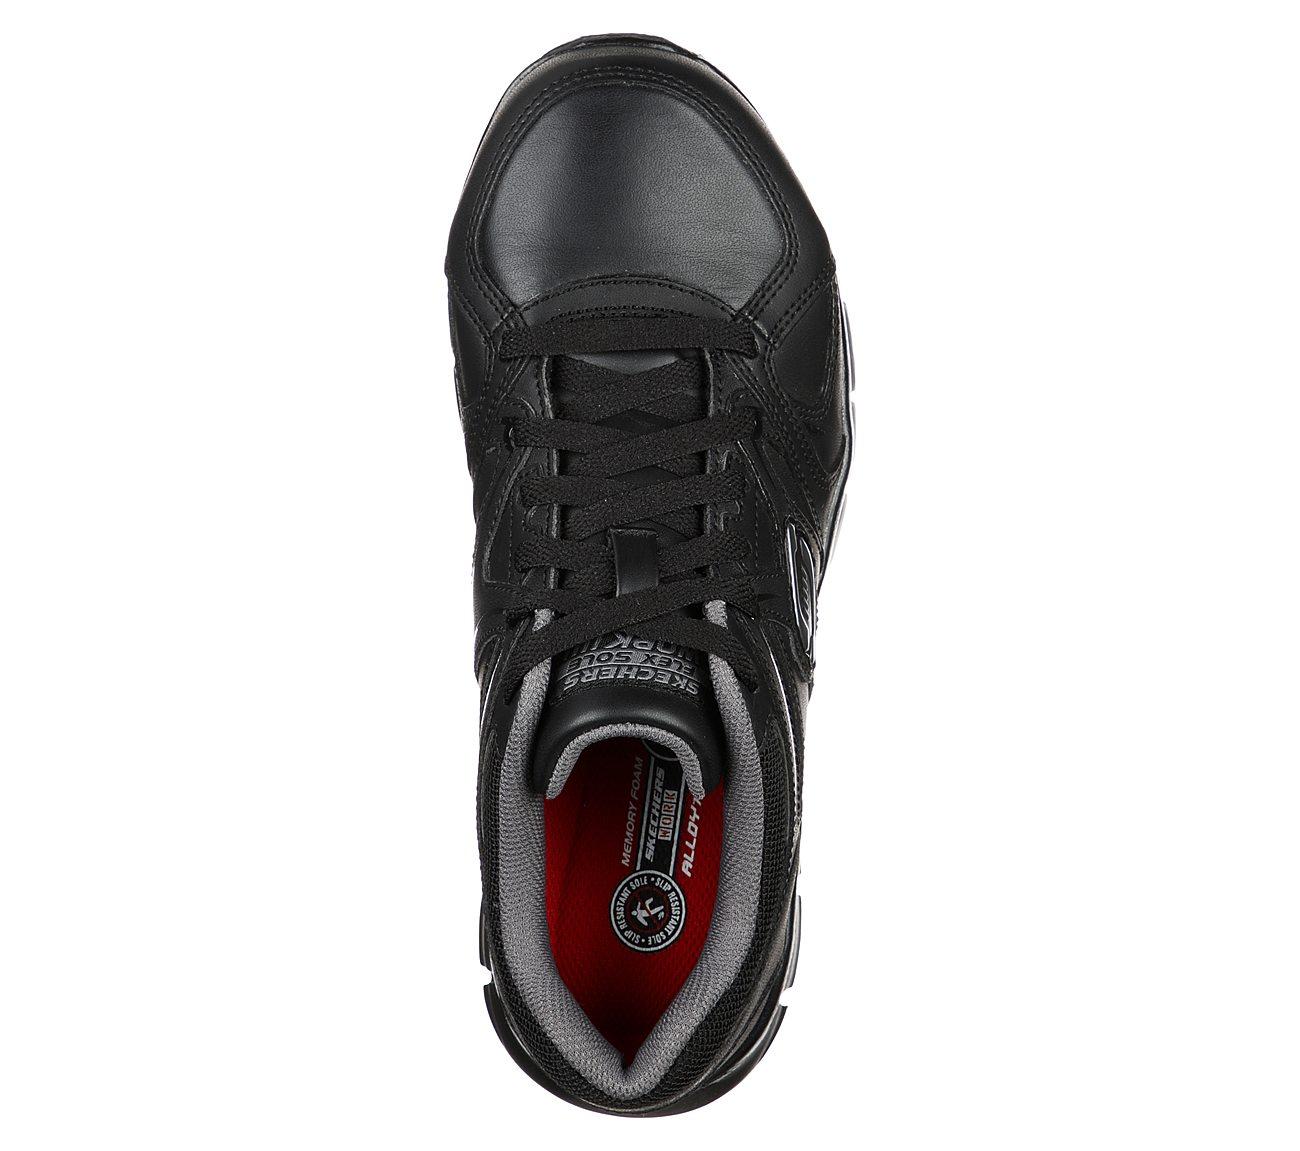 Skechers Skechers 77068bklm Men's Syngergy Ekron Lace Up Slip Resistant Athletic Alloy Toe Black Trubuck with Lime Trim